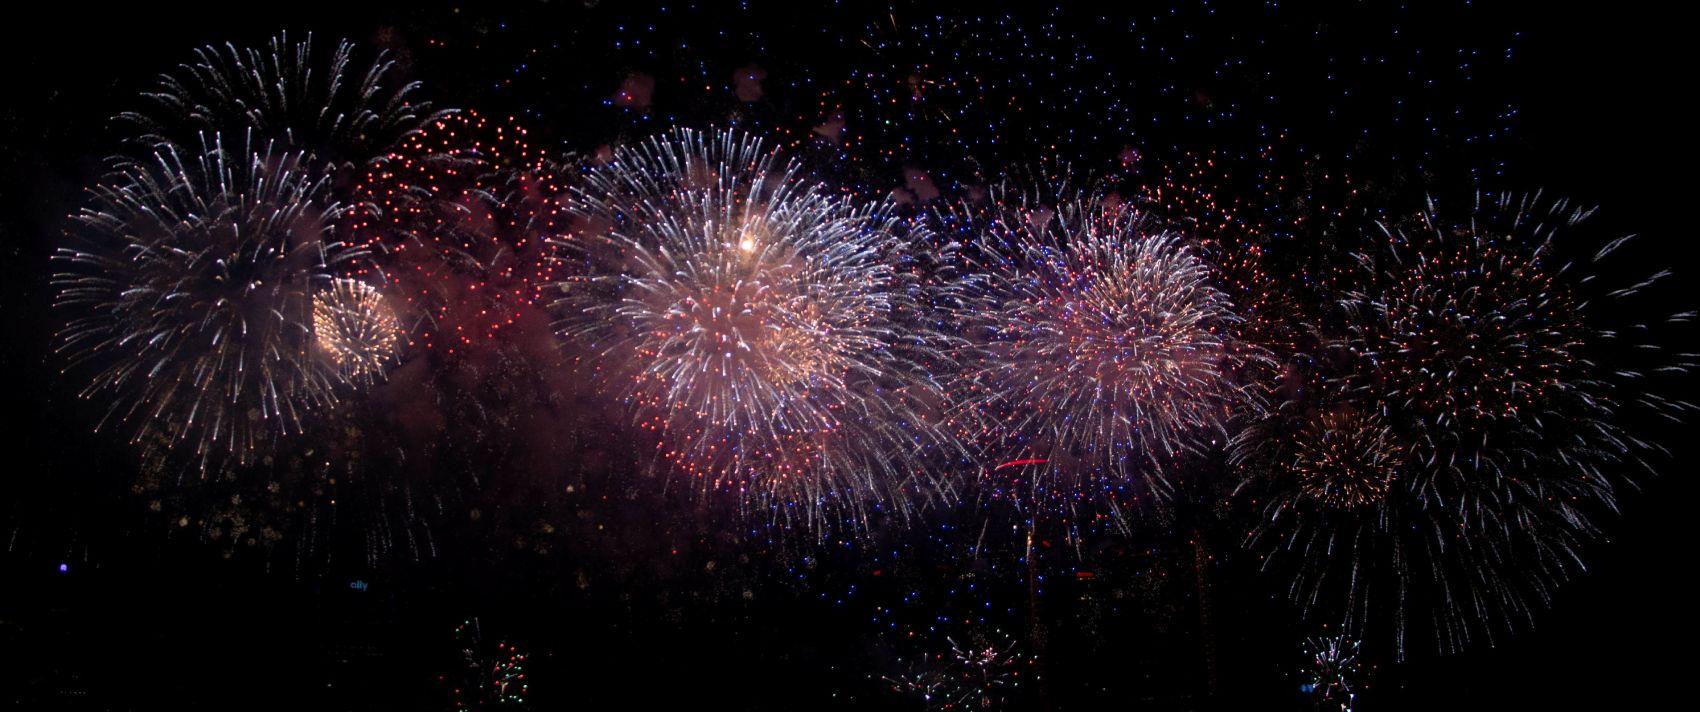 fireworks banner - trust-tru-katsande-718752-unsplash